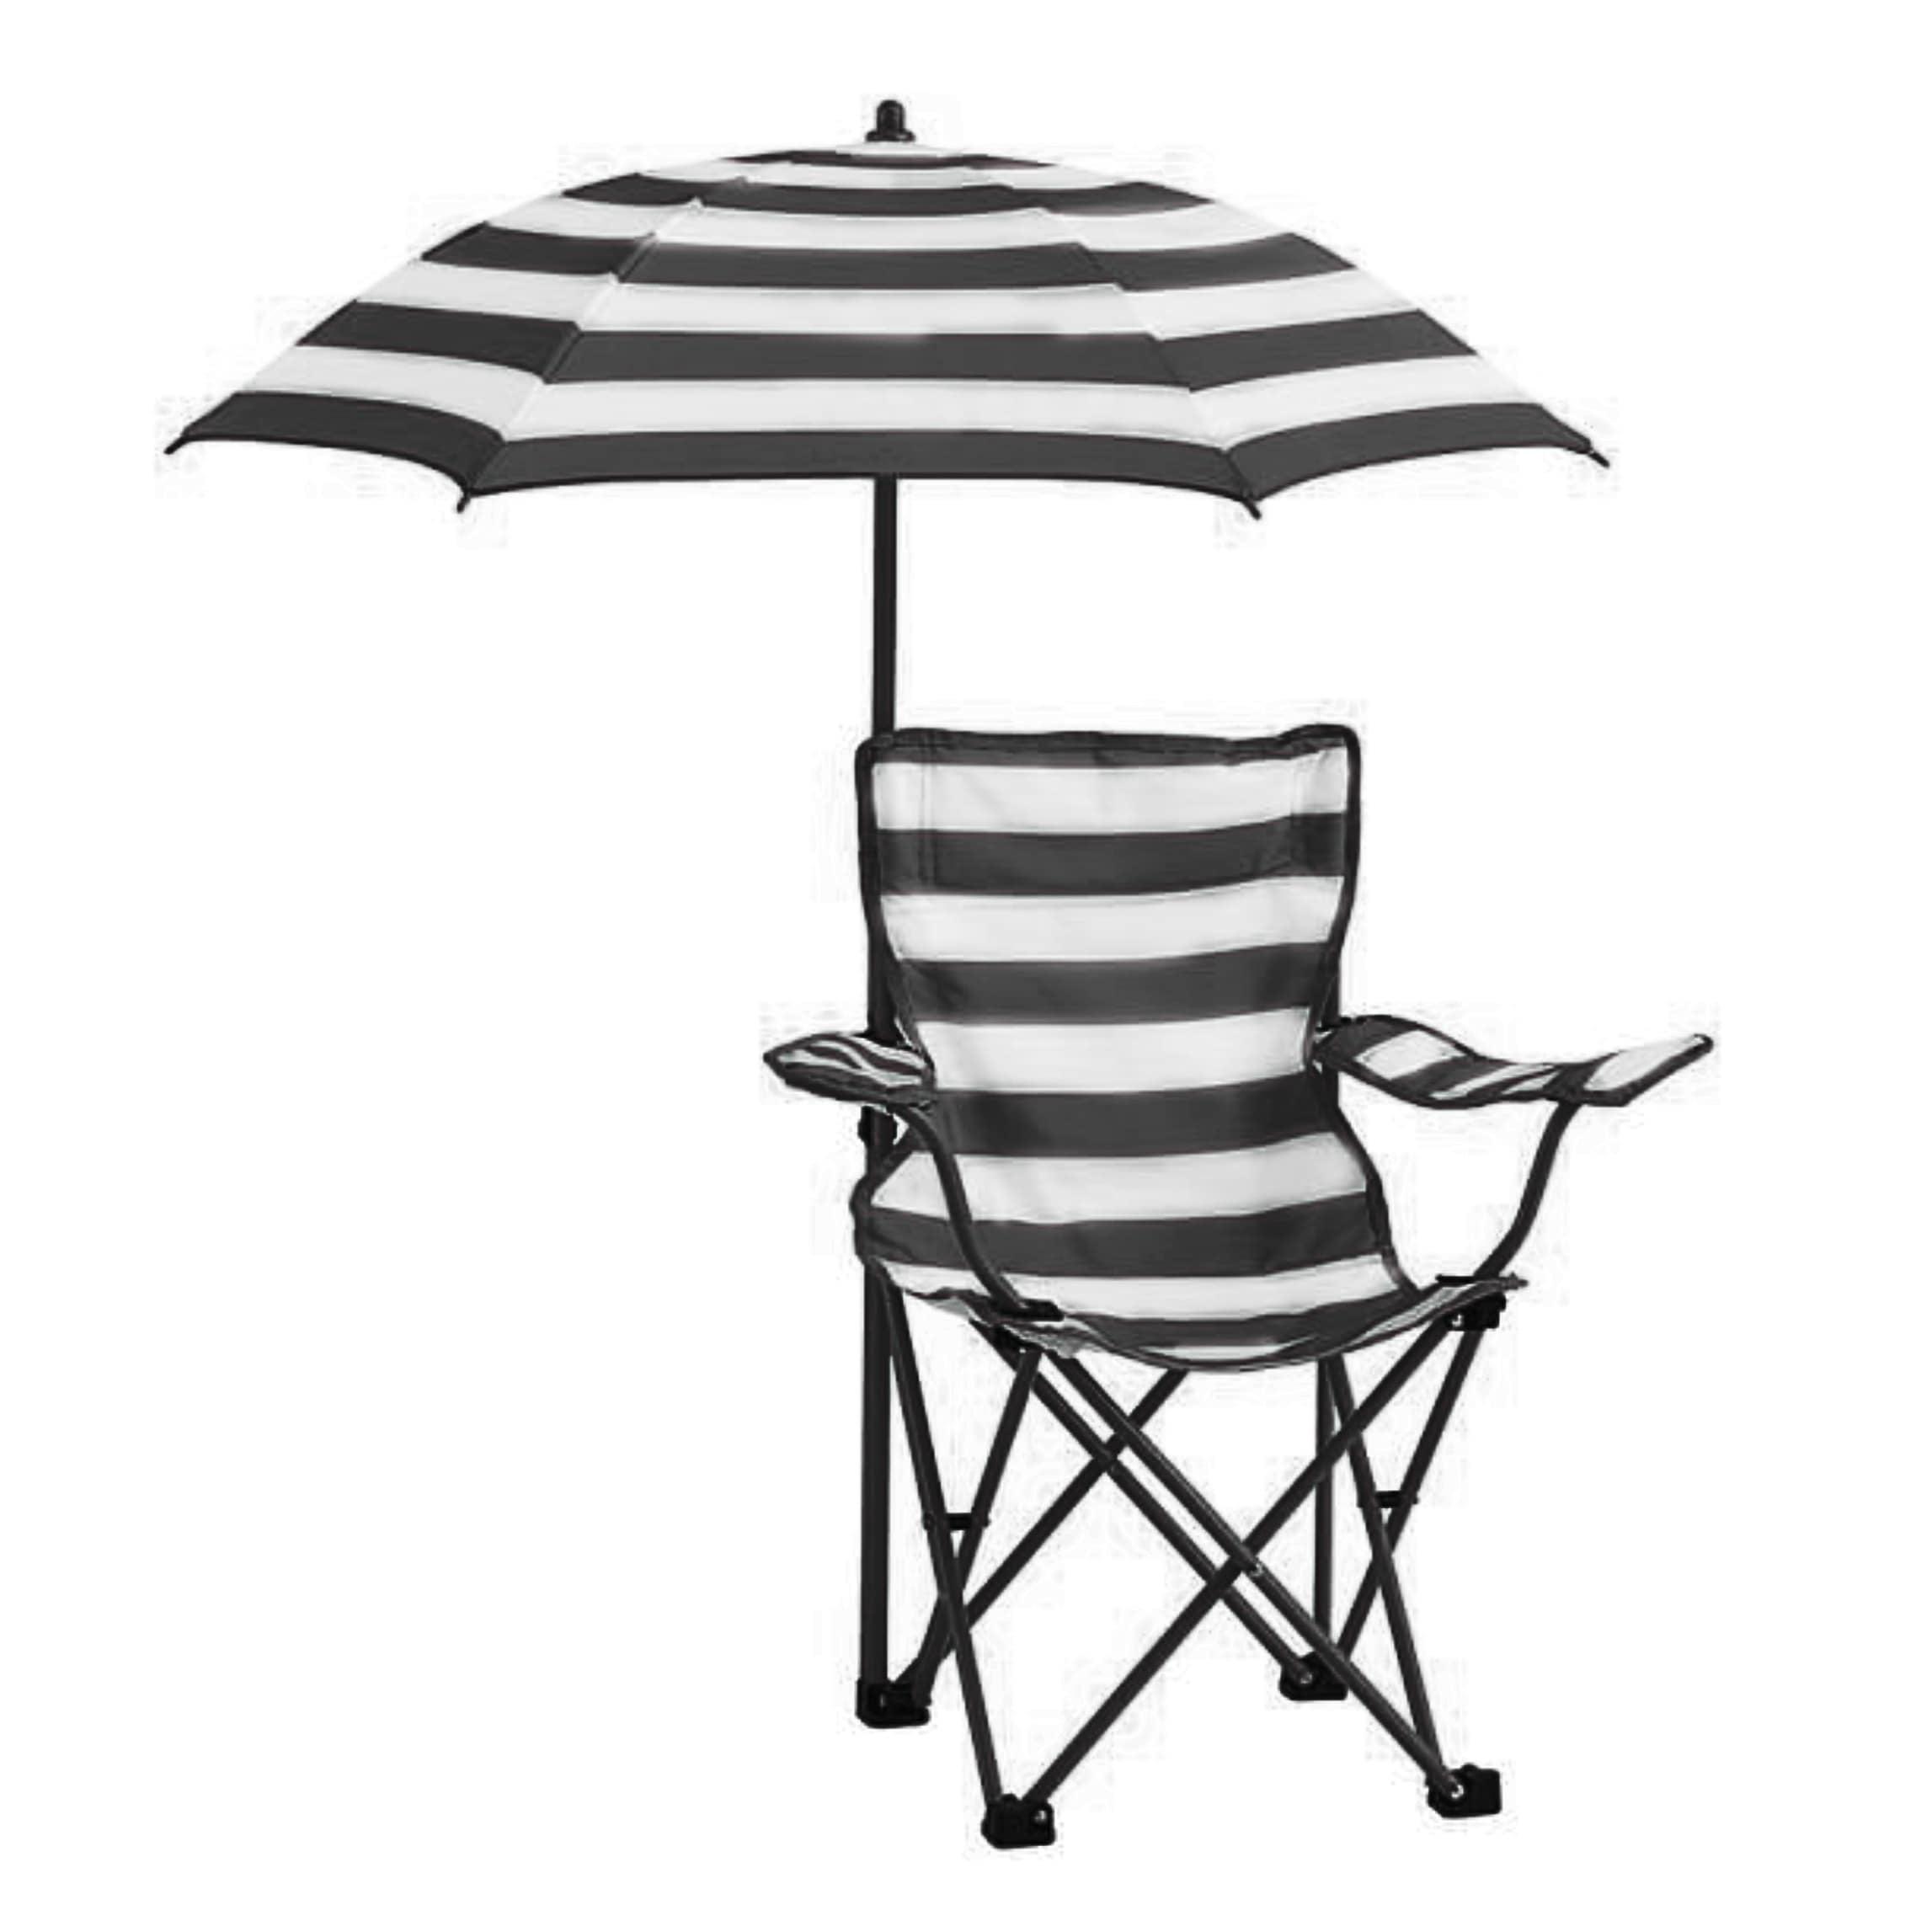 Peachy Heritage Kids Kids Rugby Stripe Beach Chair With Umbrella Evergreenethics Interior Chair Design Evergreenethicsorg